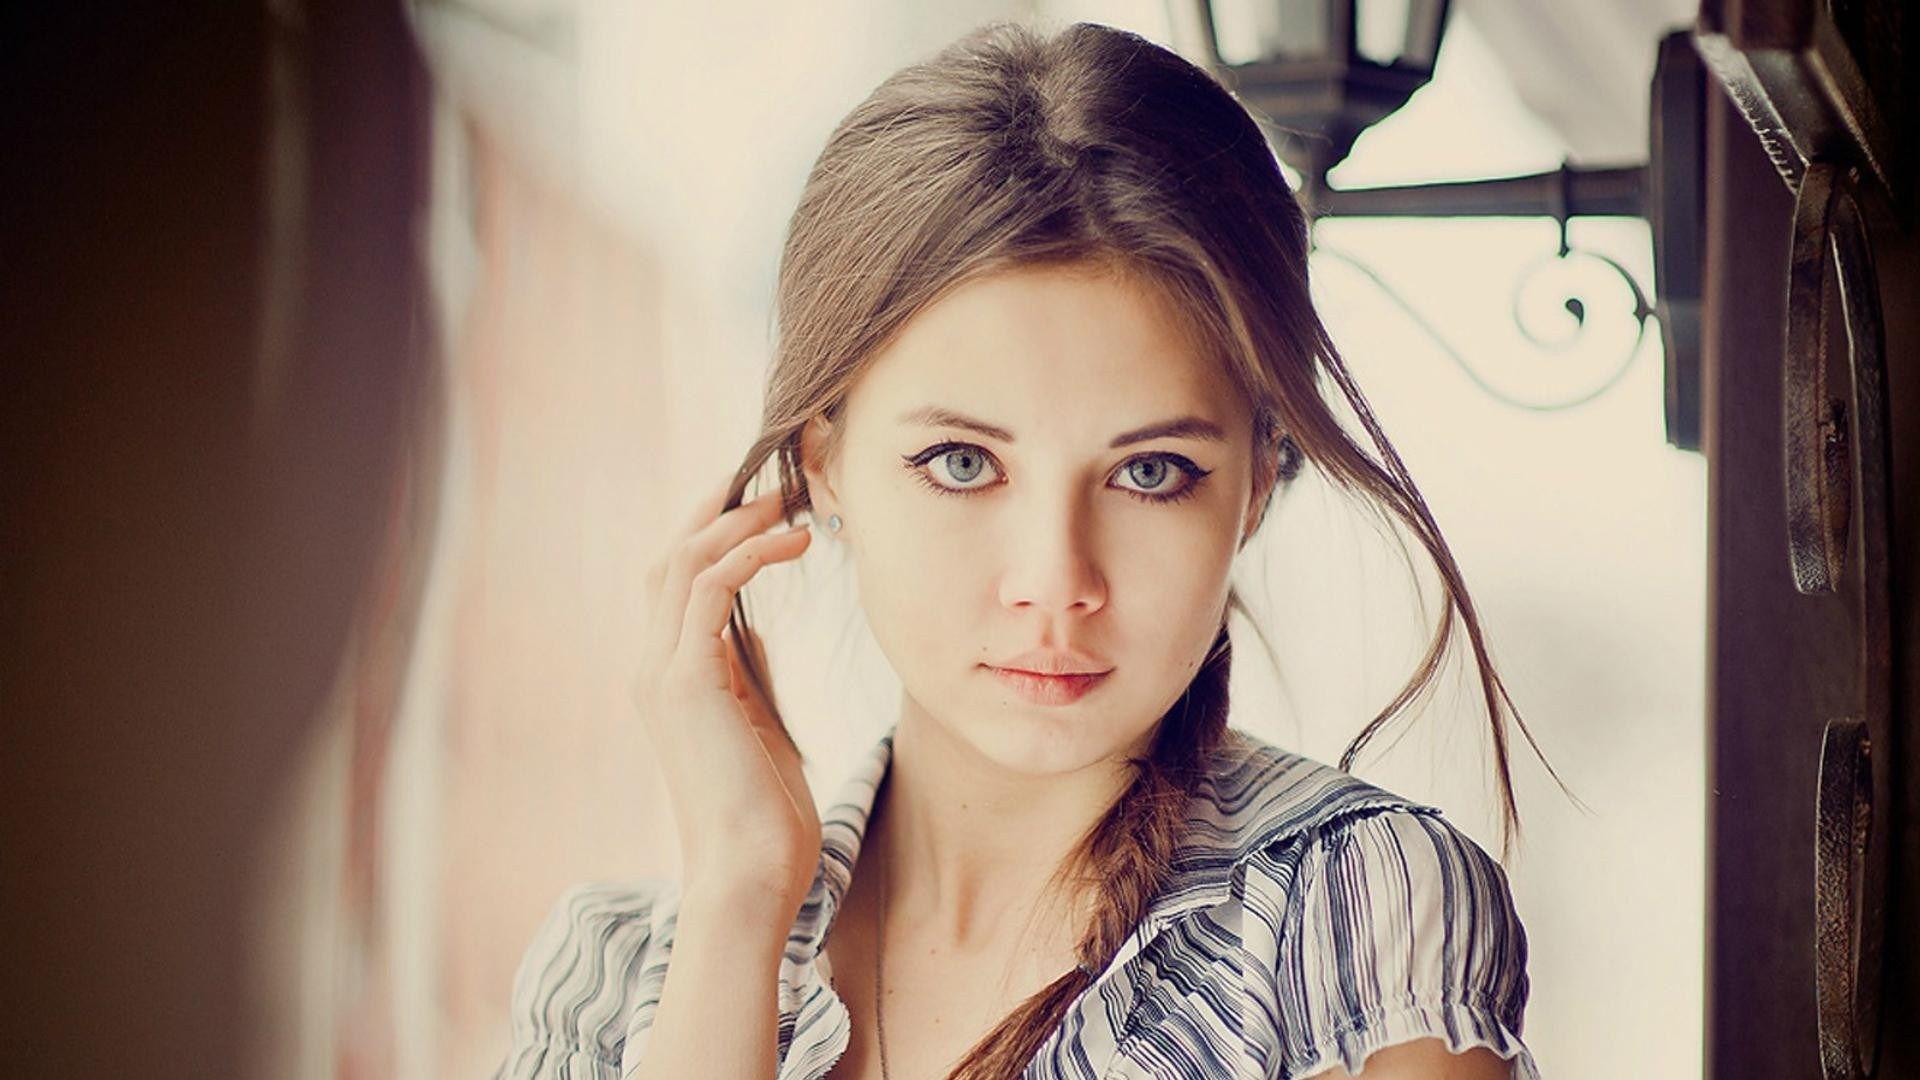 Photo Cute Girl Hd Wallpaper Freehdwall Com Free Hd Wallpapers